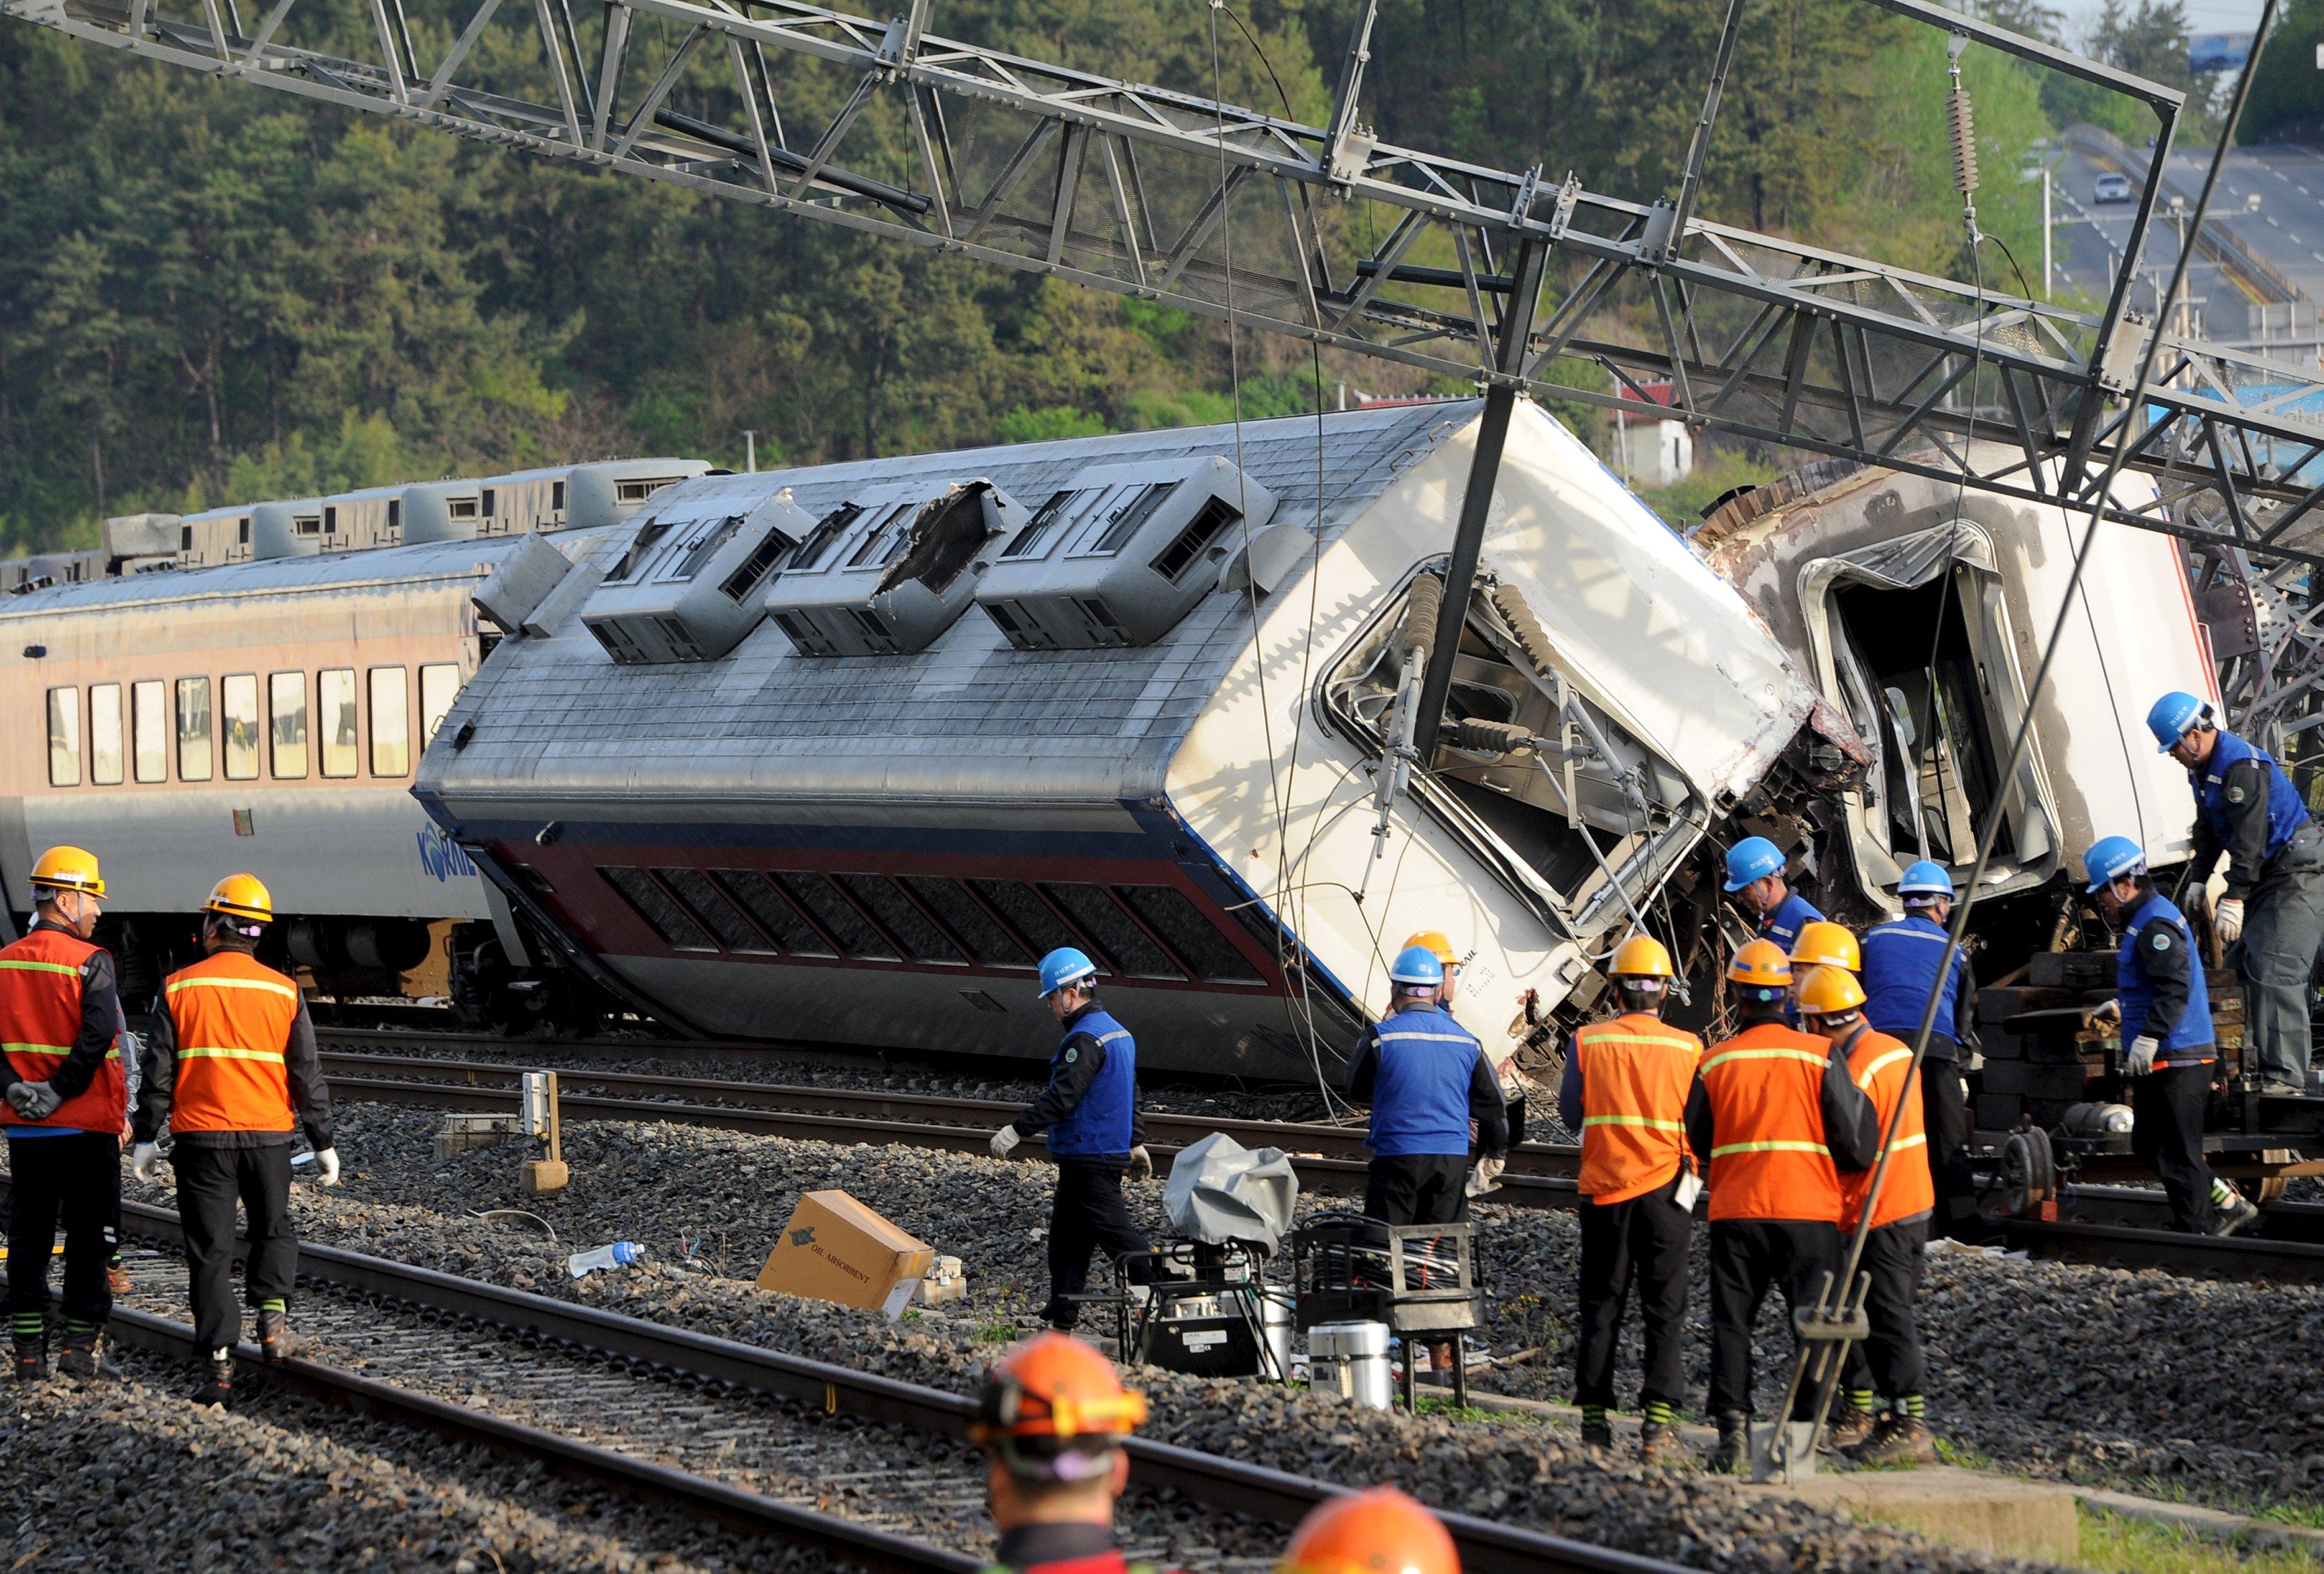 S.Korea train derails killing engineer, injuring 8